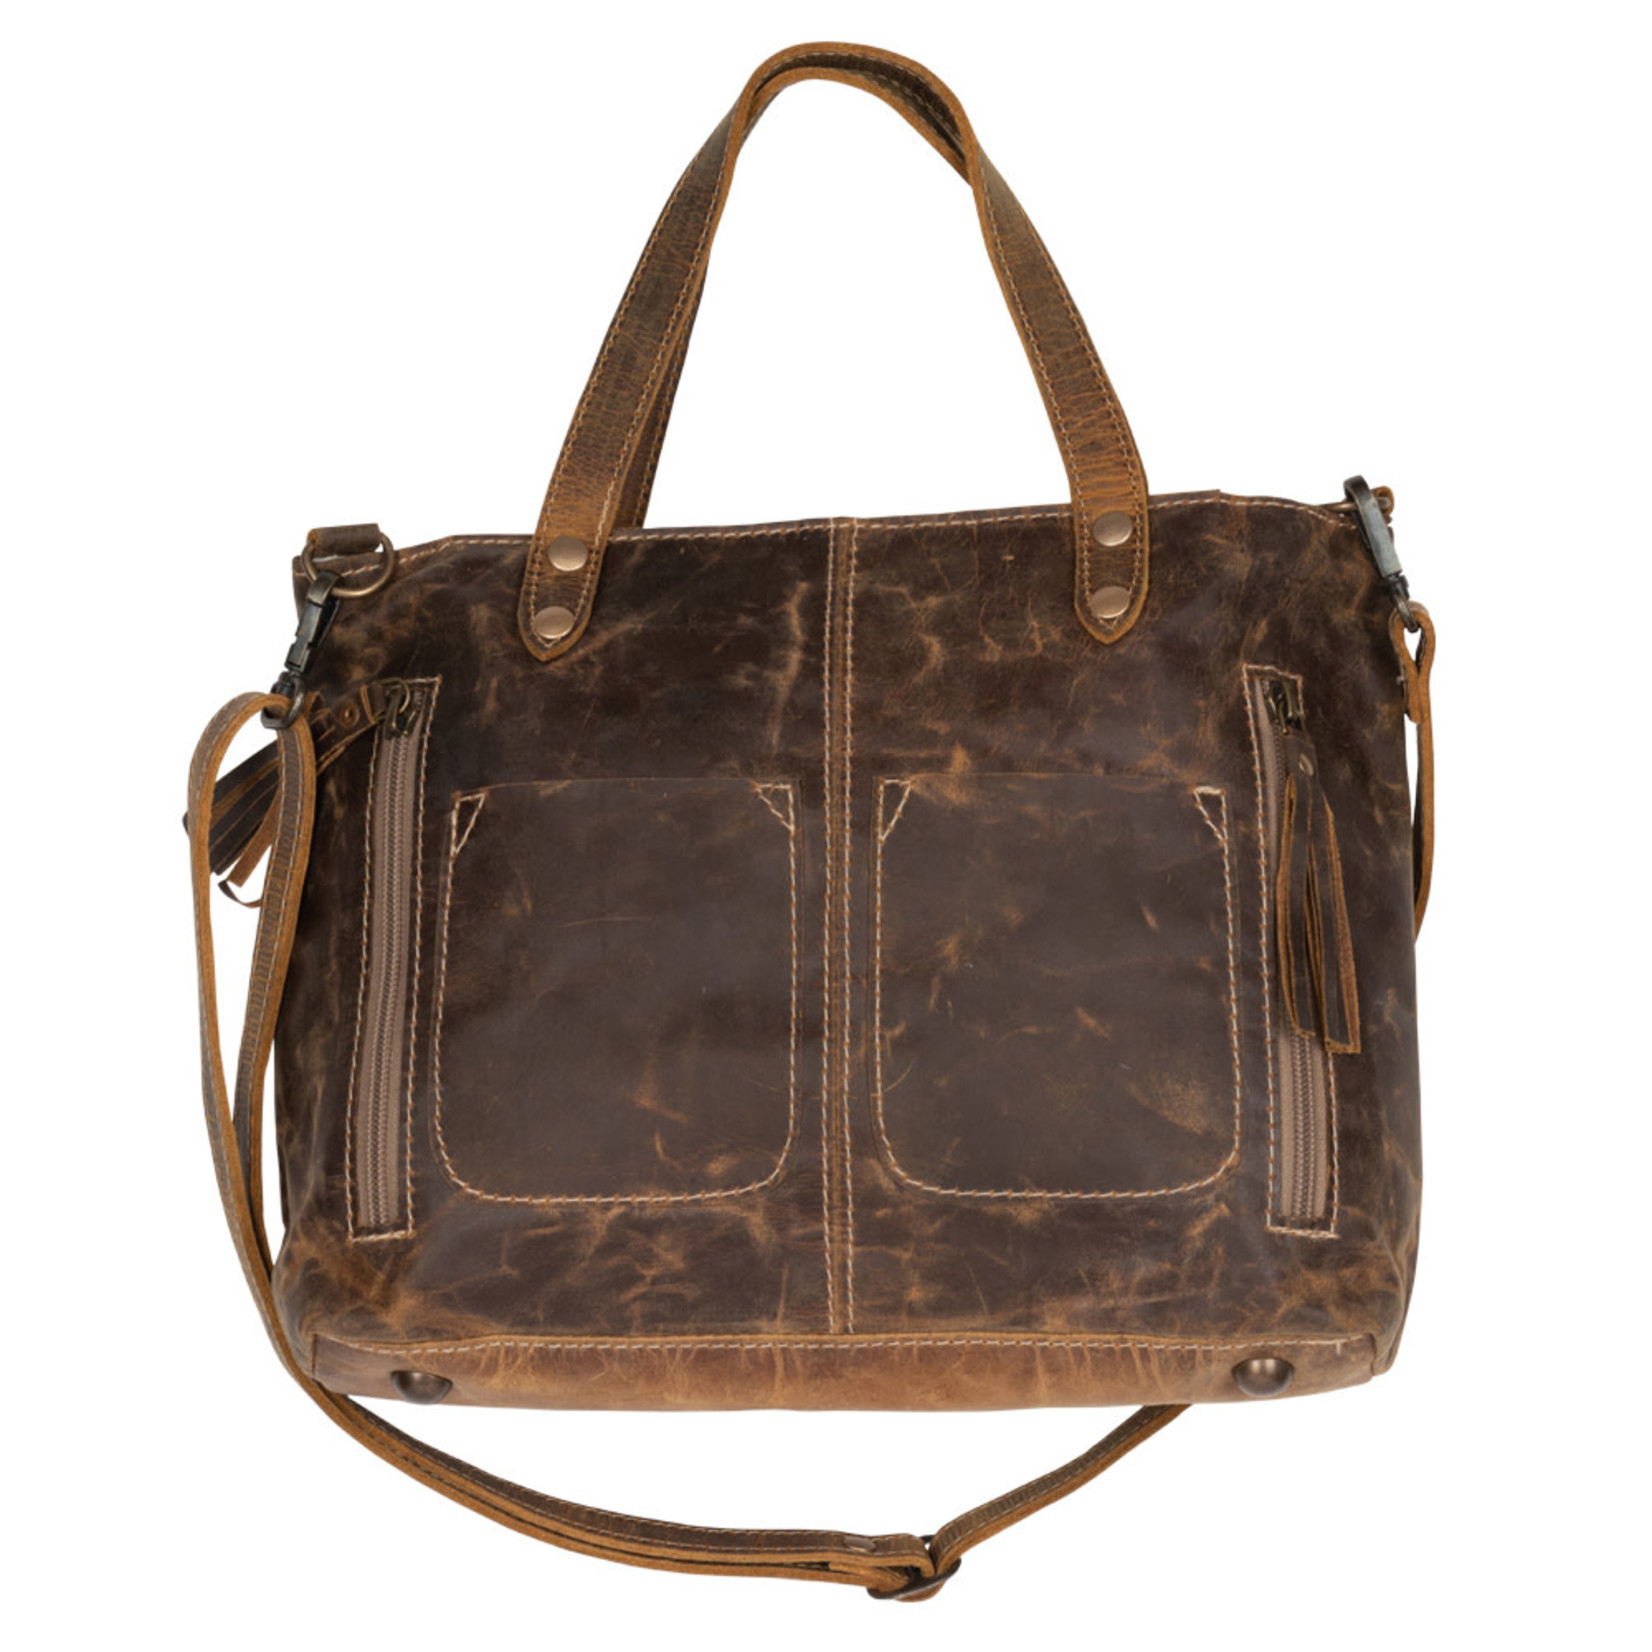 Myra Bags S-2137 Ultimate Choice Leather Bag